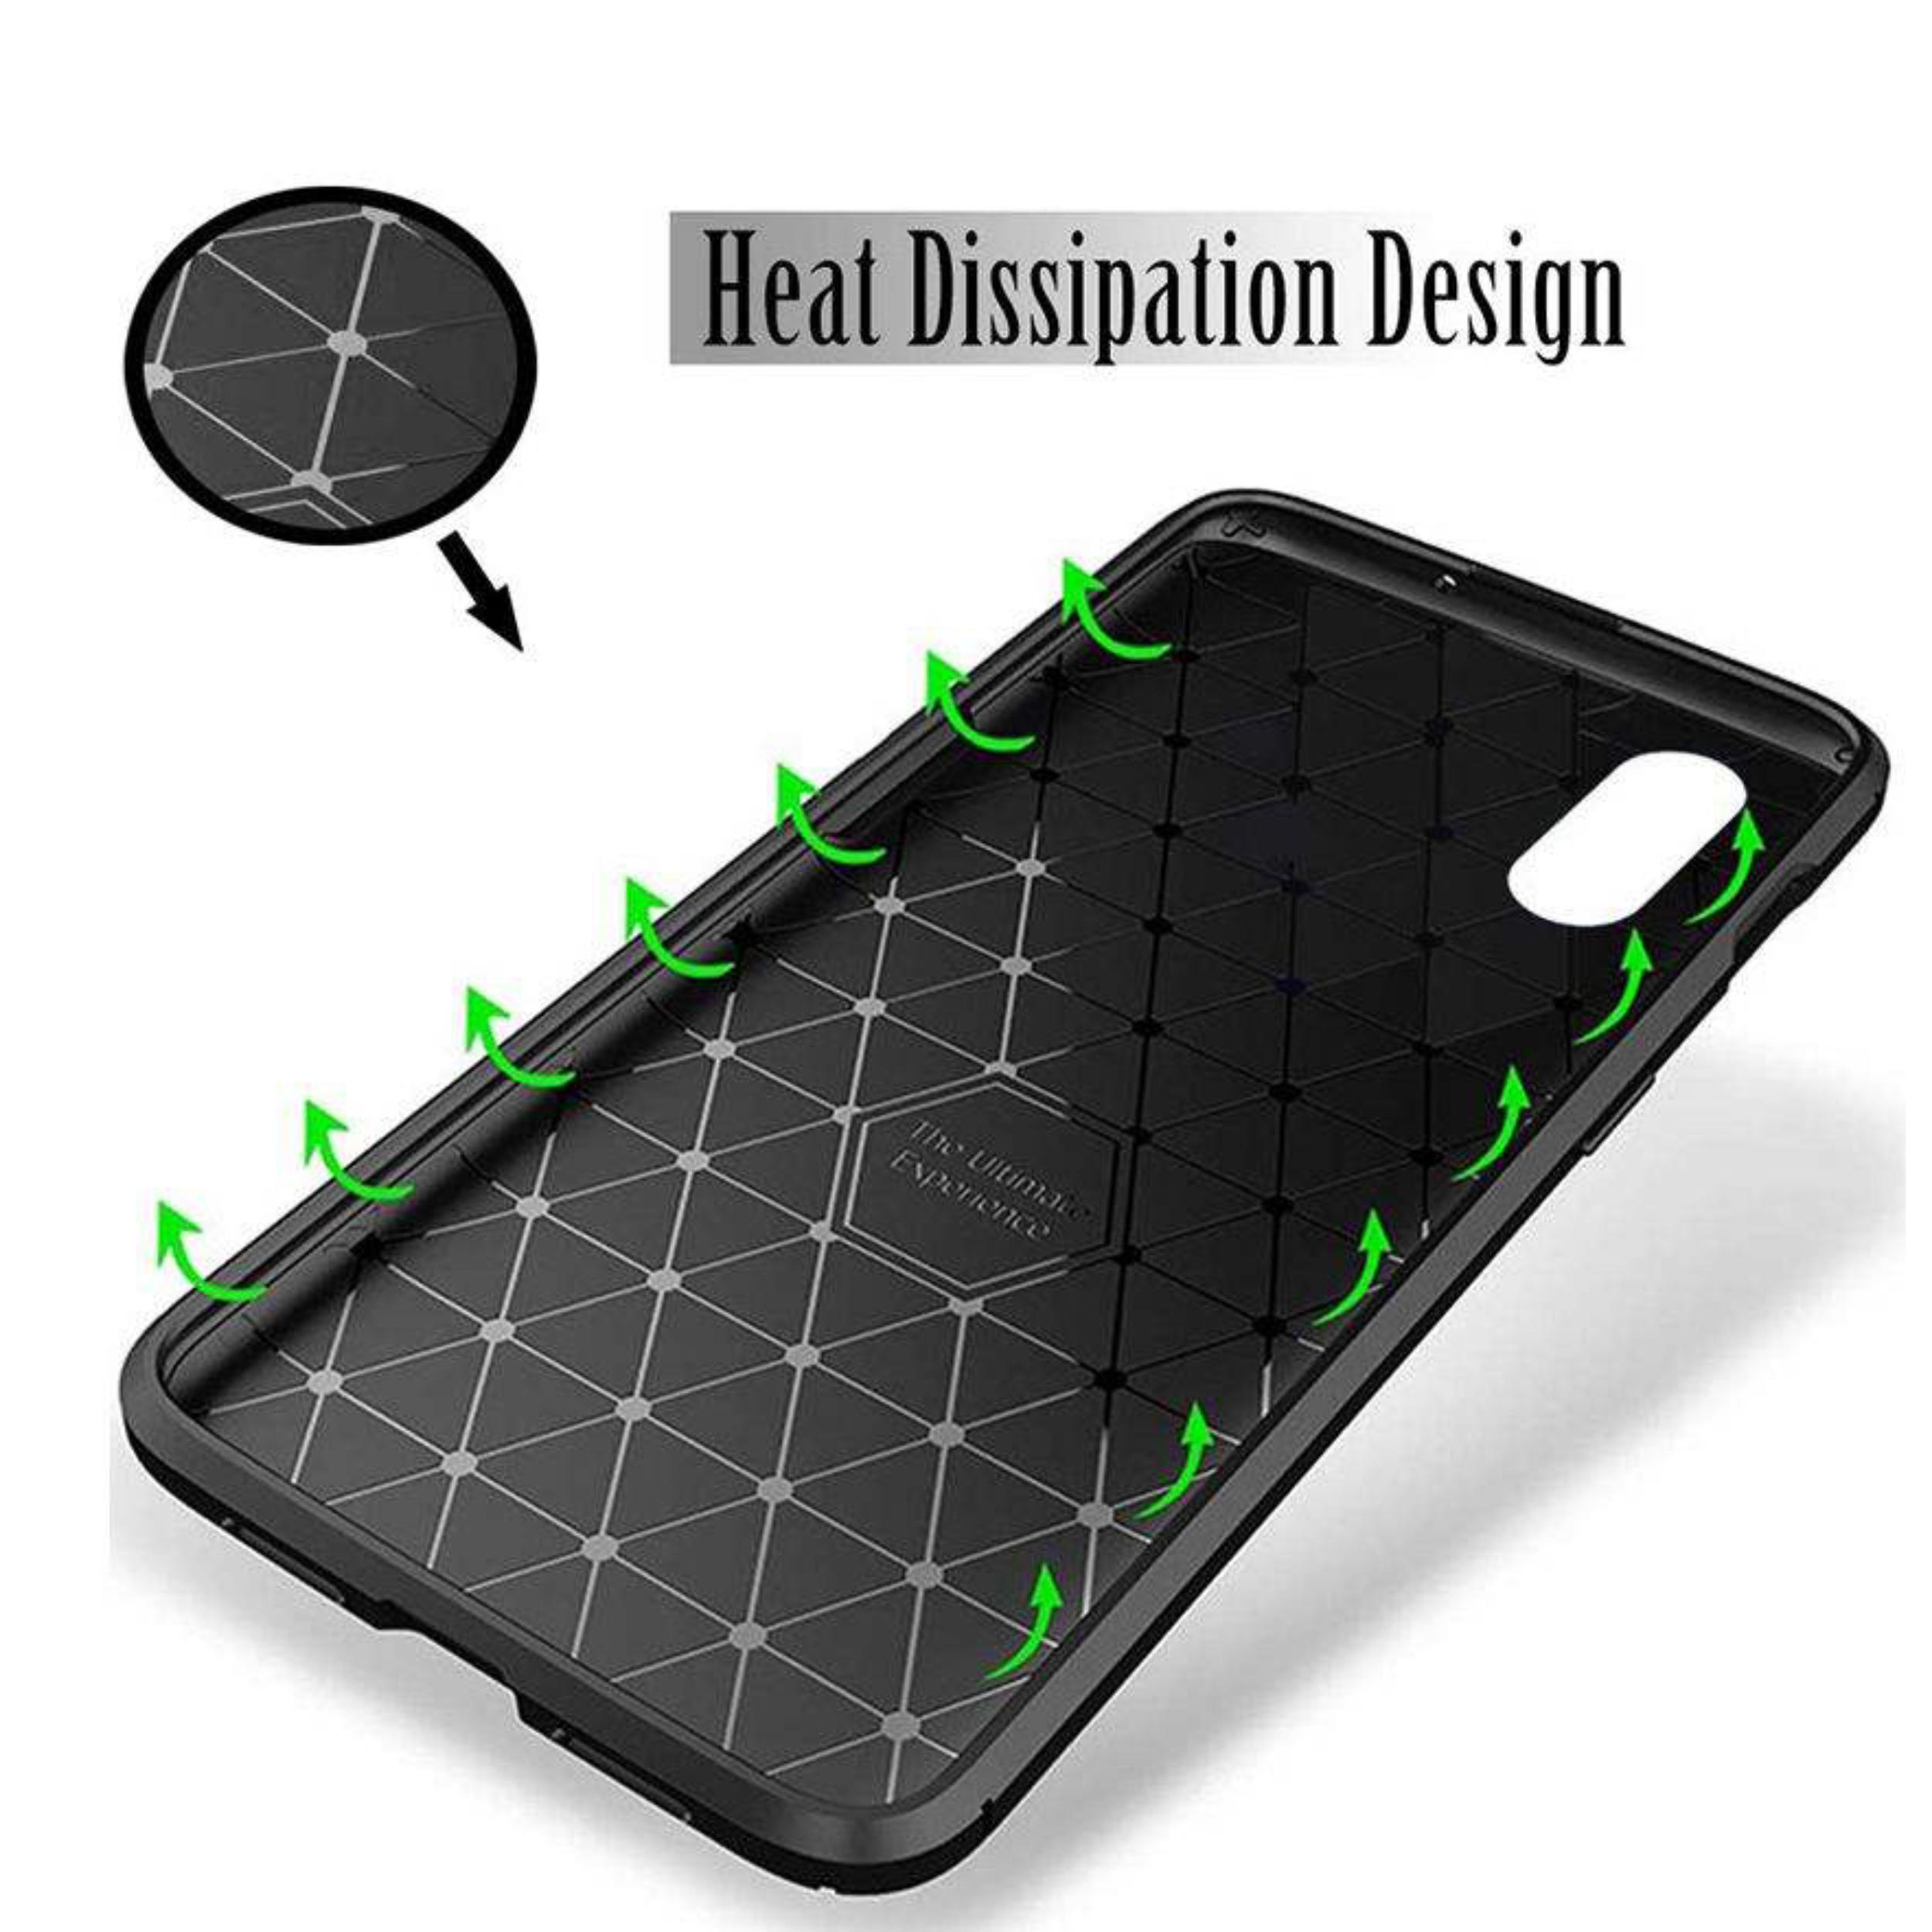 کاور لاین کینگ مدل A21 مناسب برای گوشی موبایل سامسونگ Galaxy A50/A50s/A30s thumb 2 11